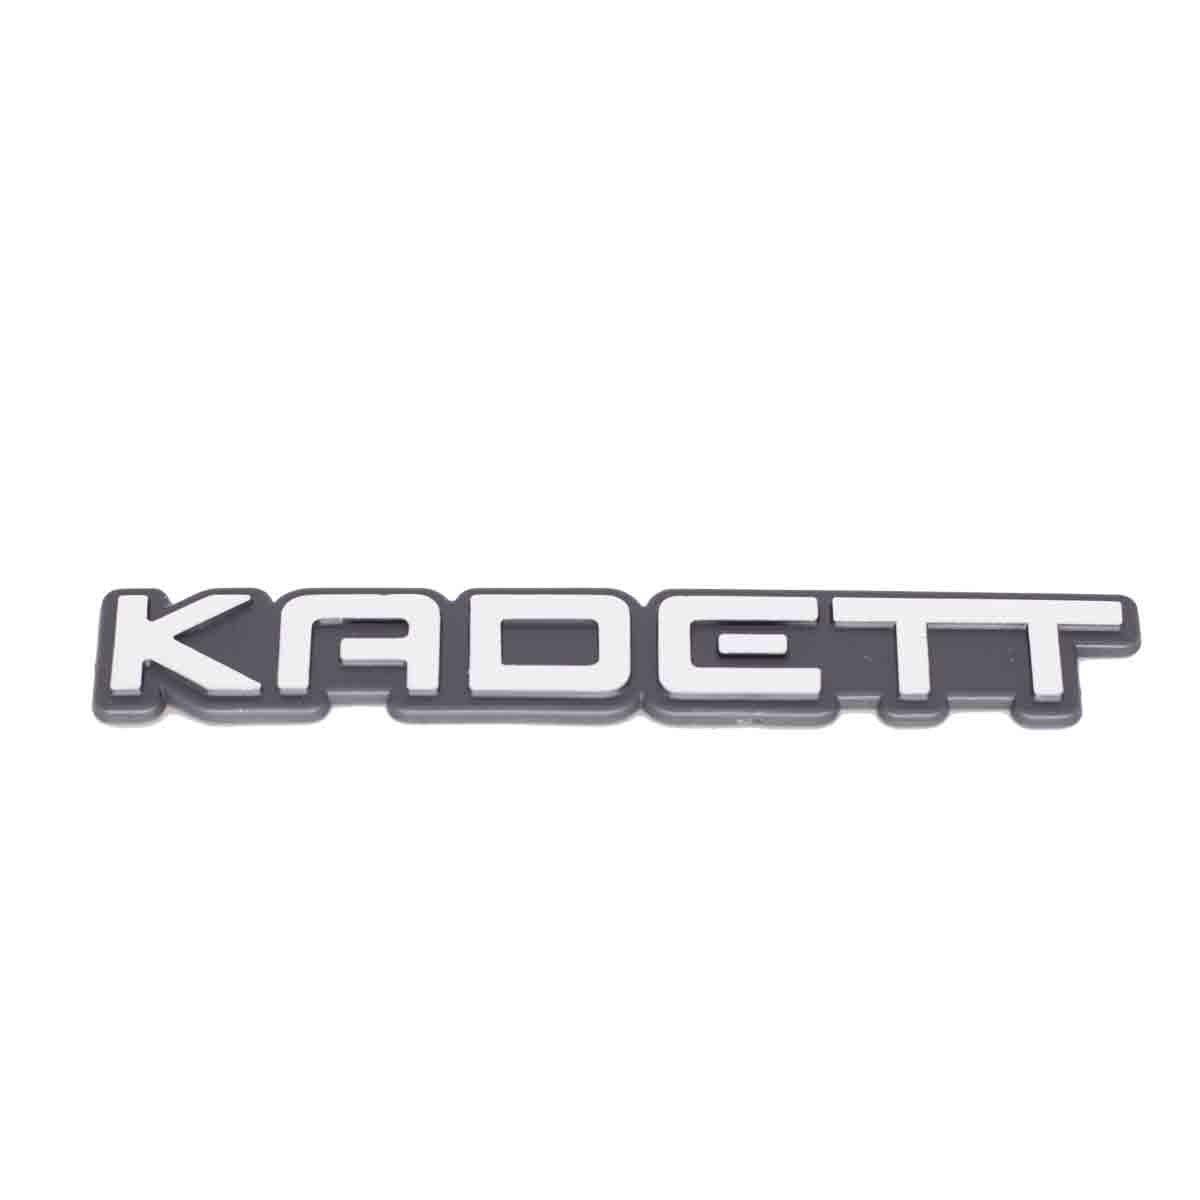 Emblema Kadett /91